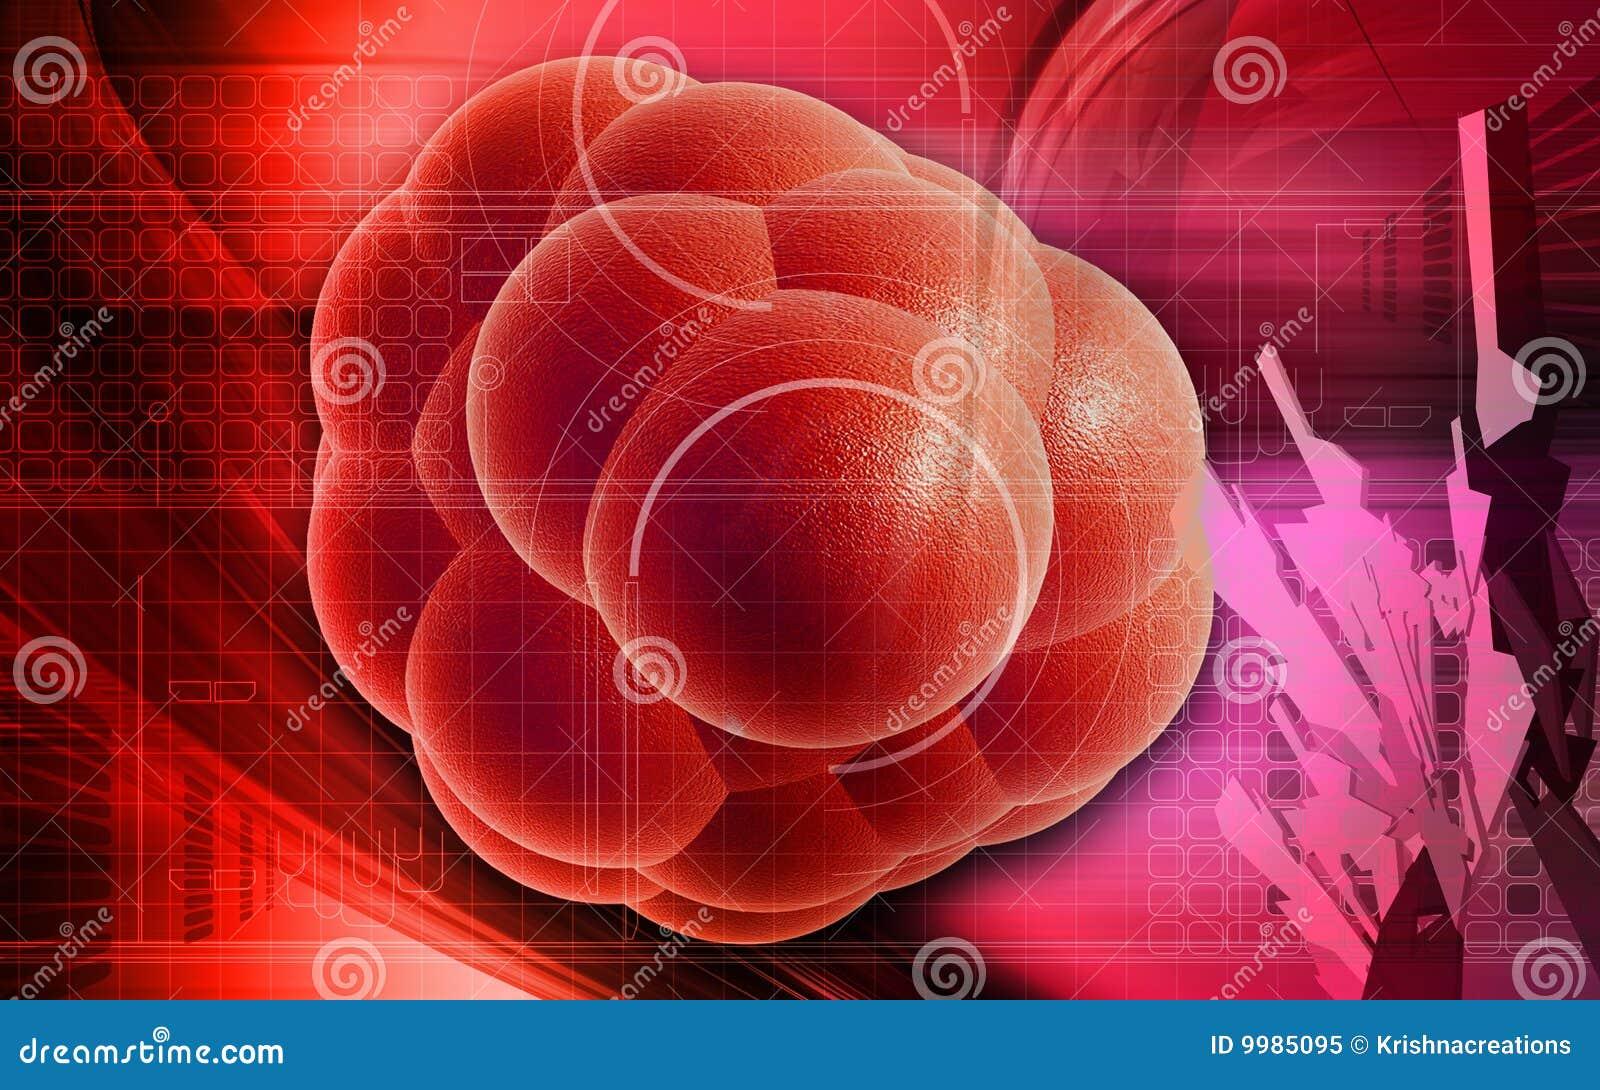 Cellstem